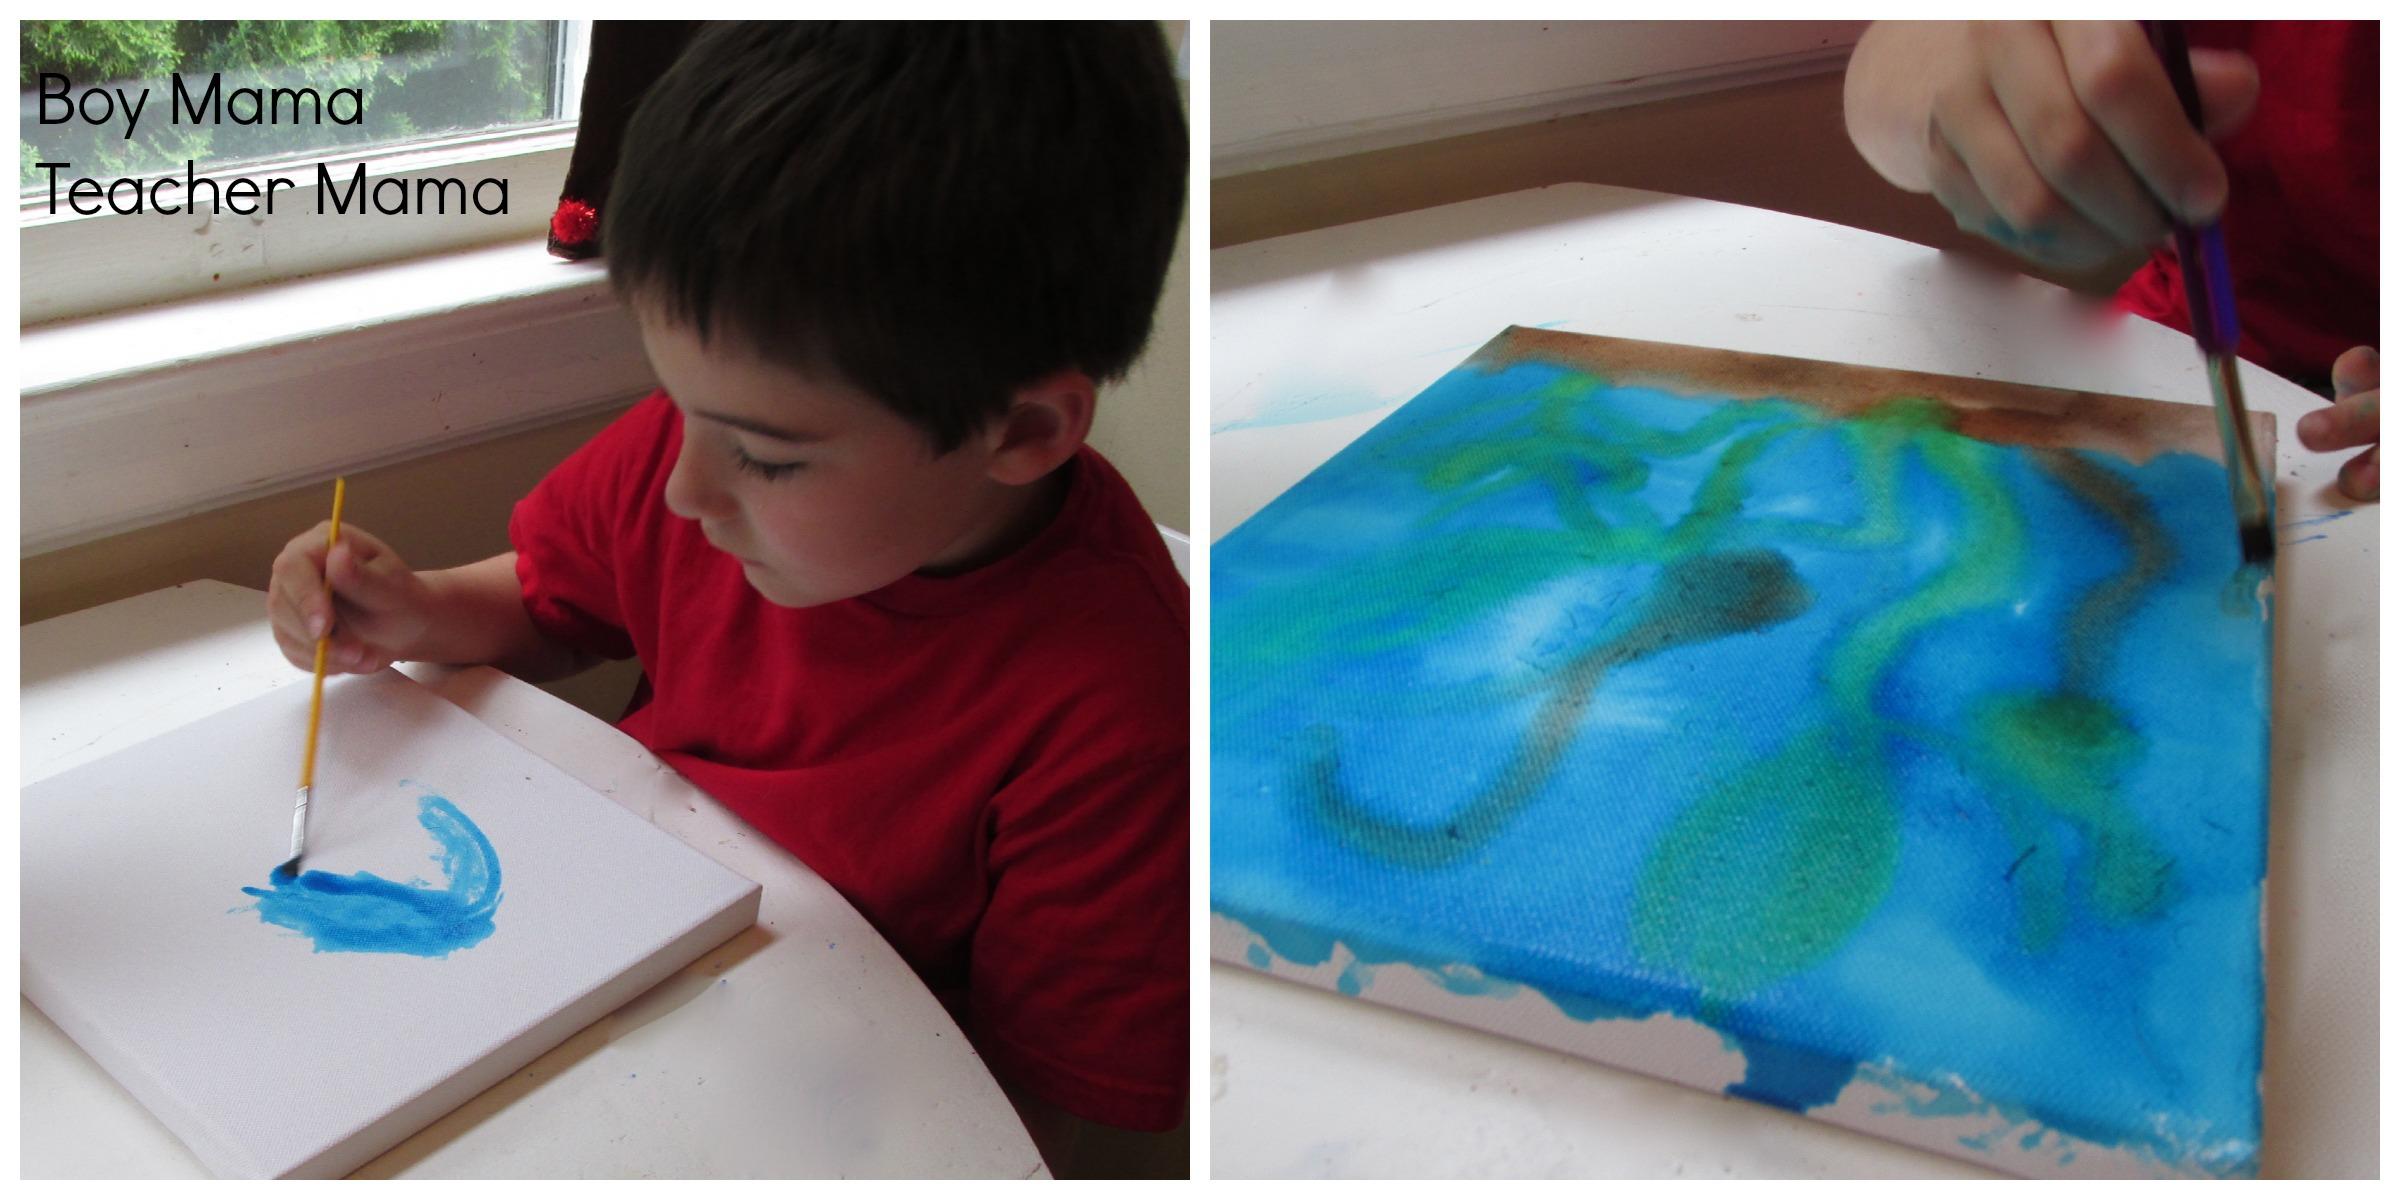 Boy Mama Under The Sea Art Boy Mama Teacher Mama - Ocean floor painting